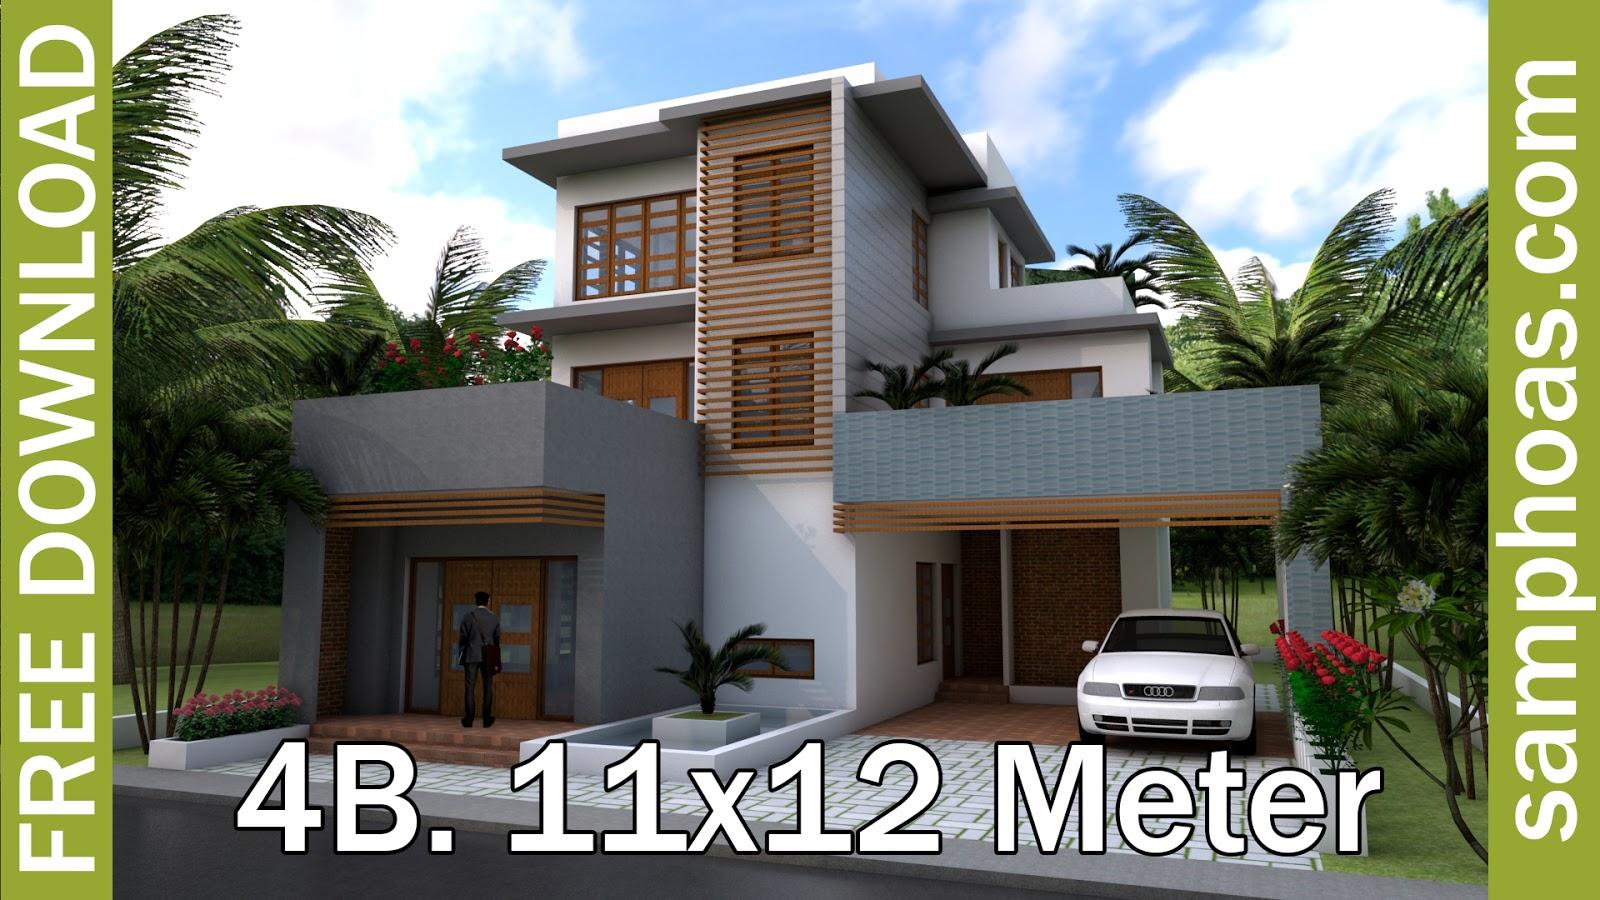 Sketchup Modern 4 Bedrooms Home Plan 11x12m - House Plan Map